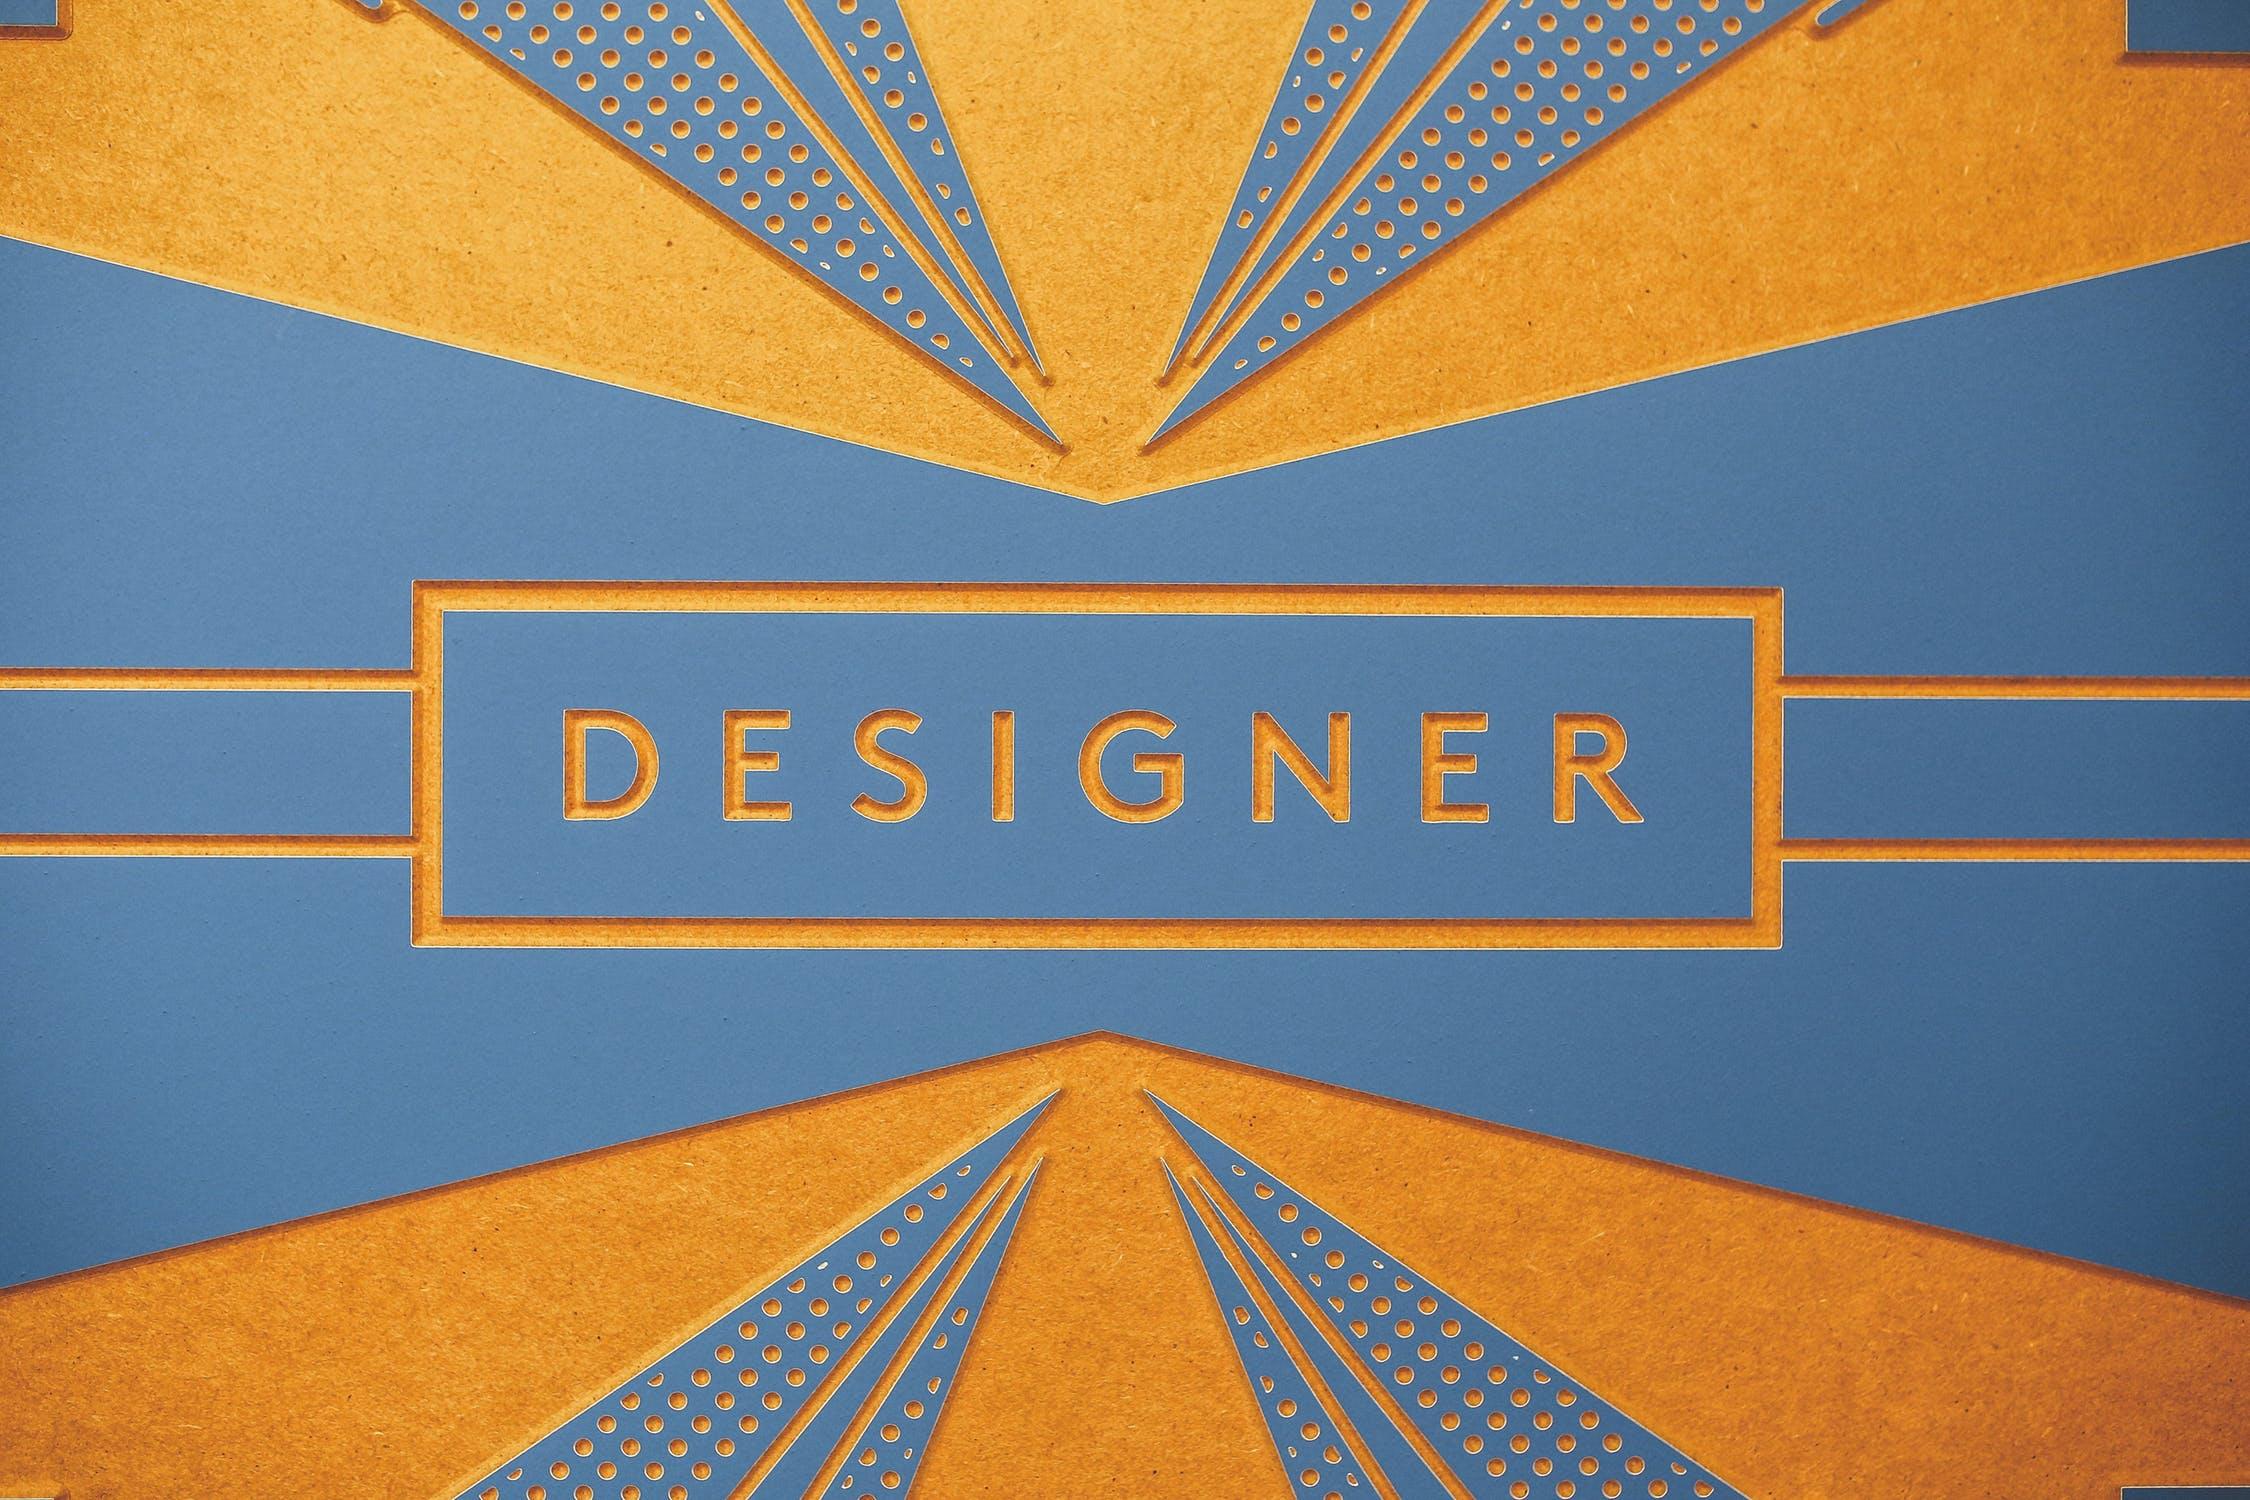 designer-board-typo-word